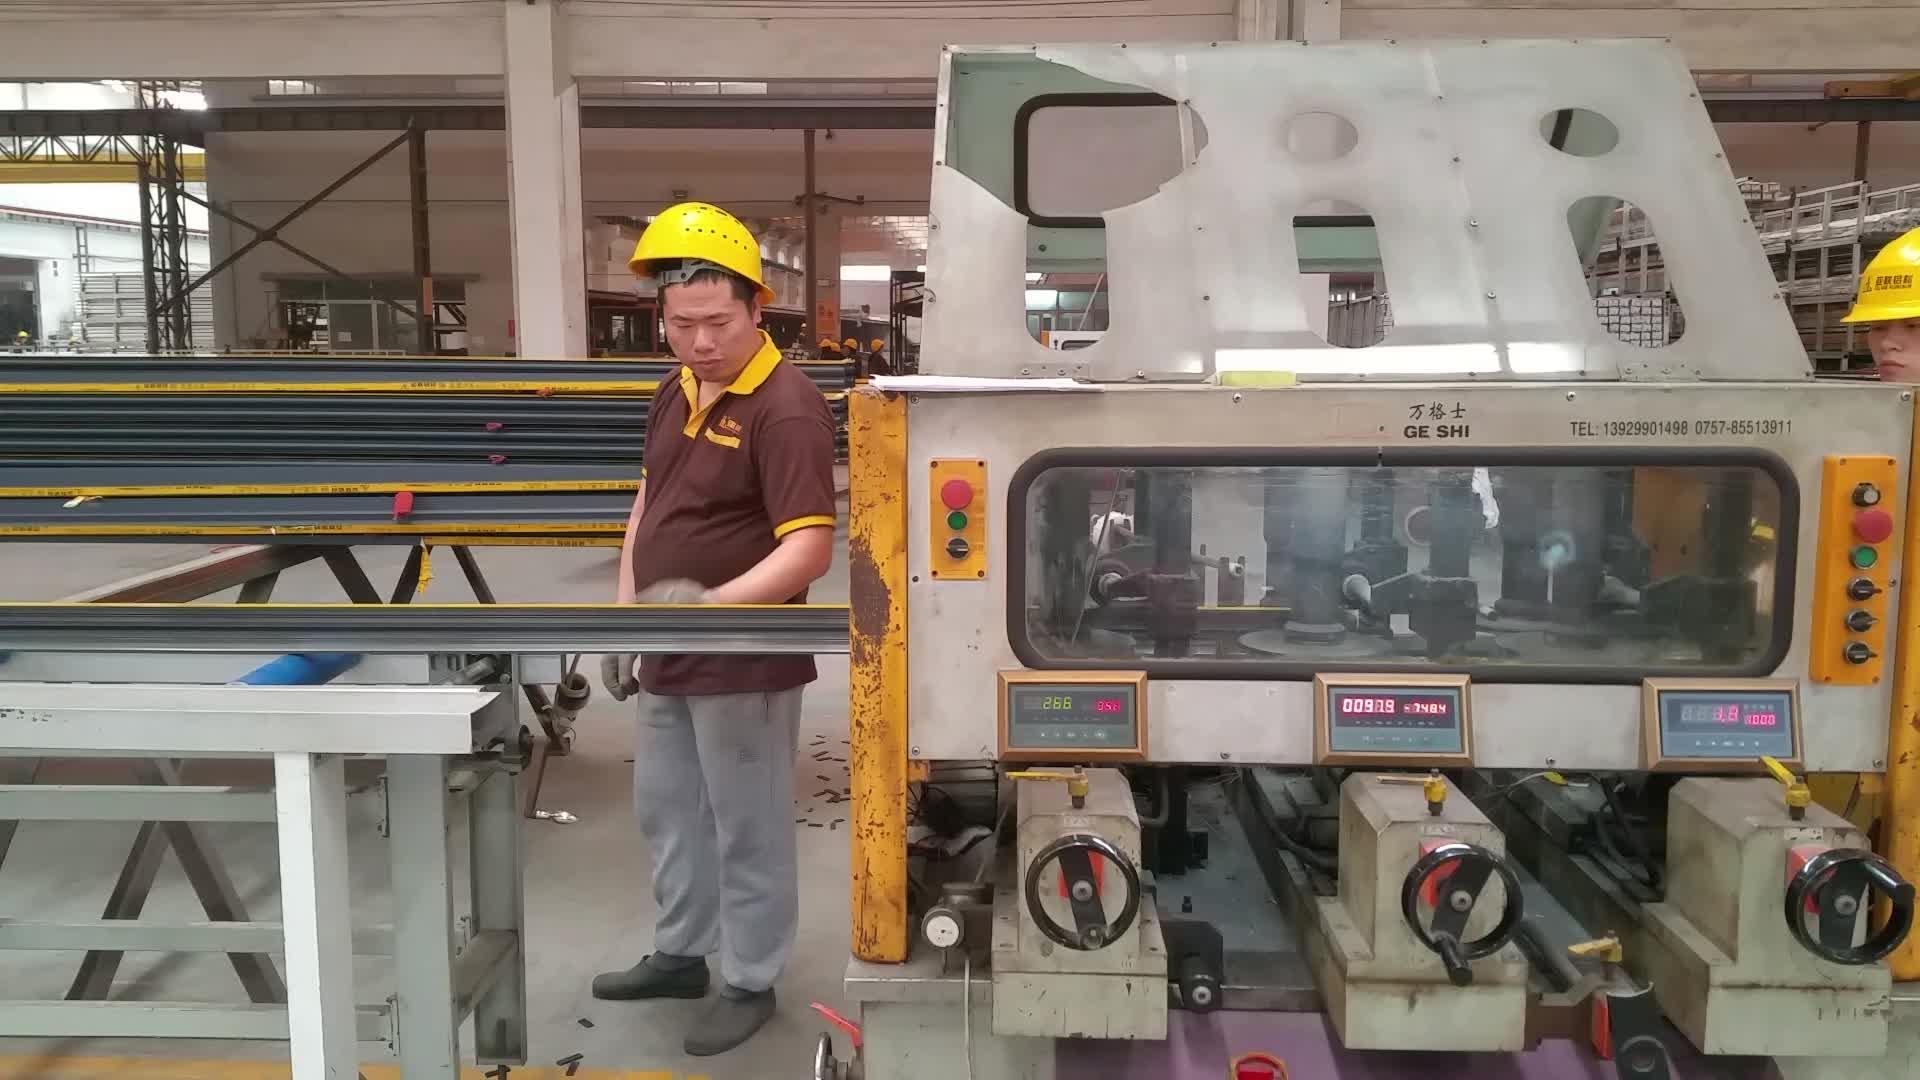 aluminium extrusion 2020 3030 4040 4545 3090 3060 4080 v slot profiles for pergola gazebo